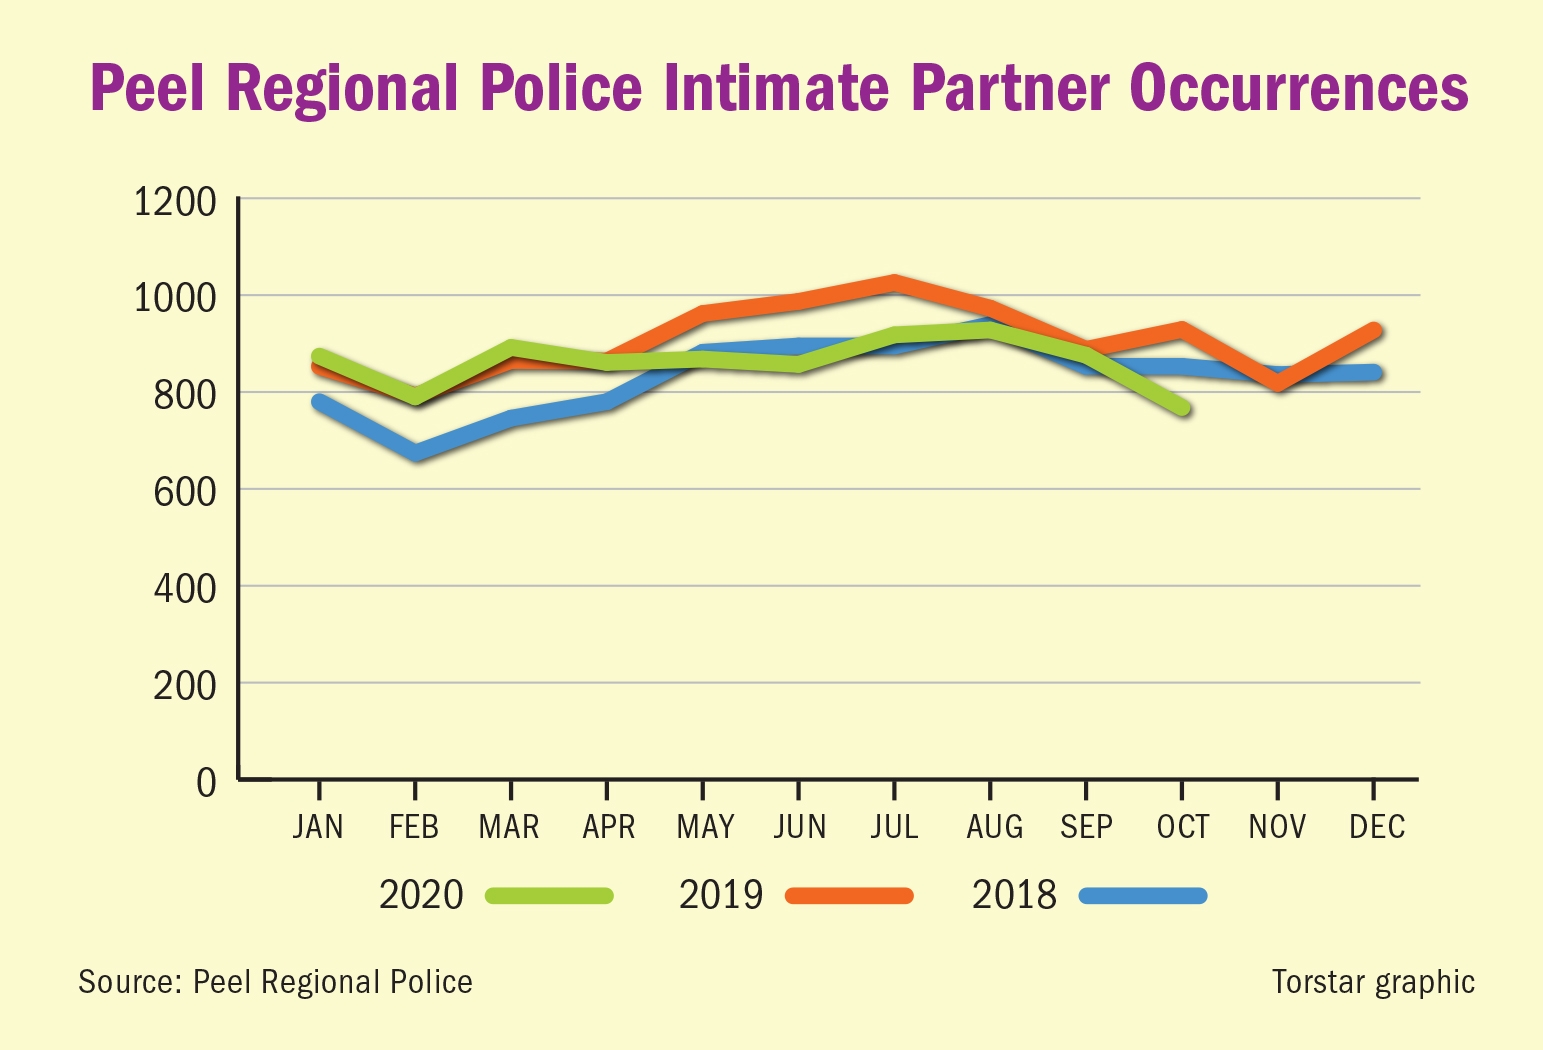 Peel Region intimate partner violence, domestic violence, domestic abuse,